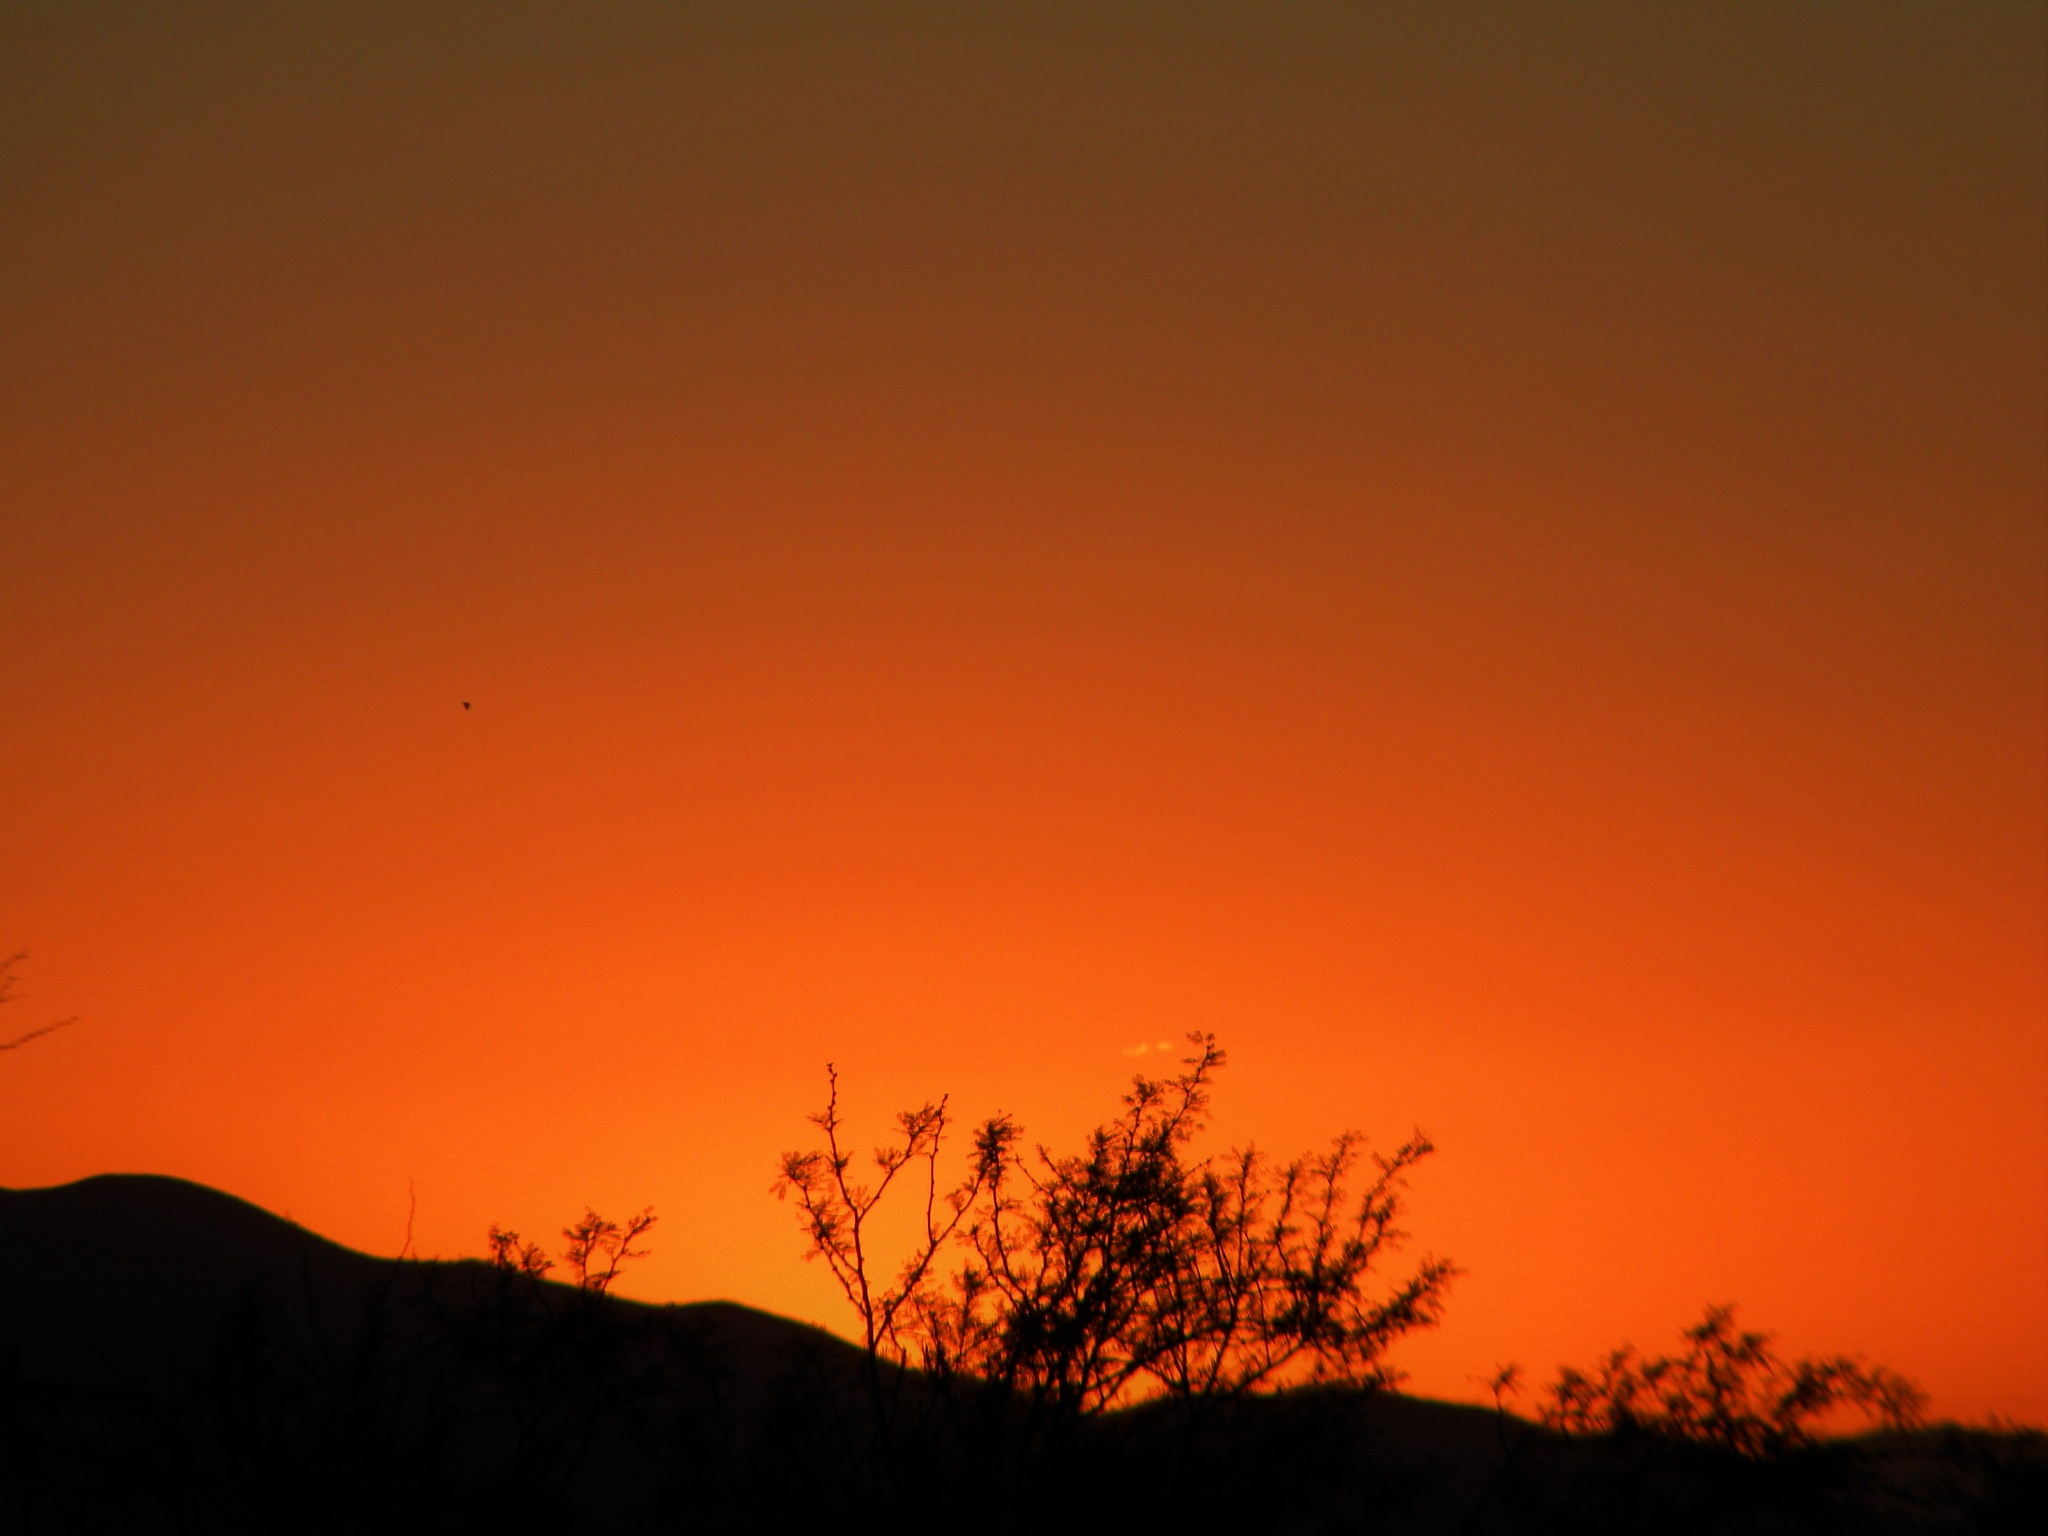 Desert Sunset by Alan Wertsbaugh